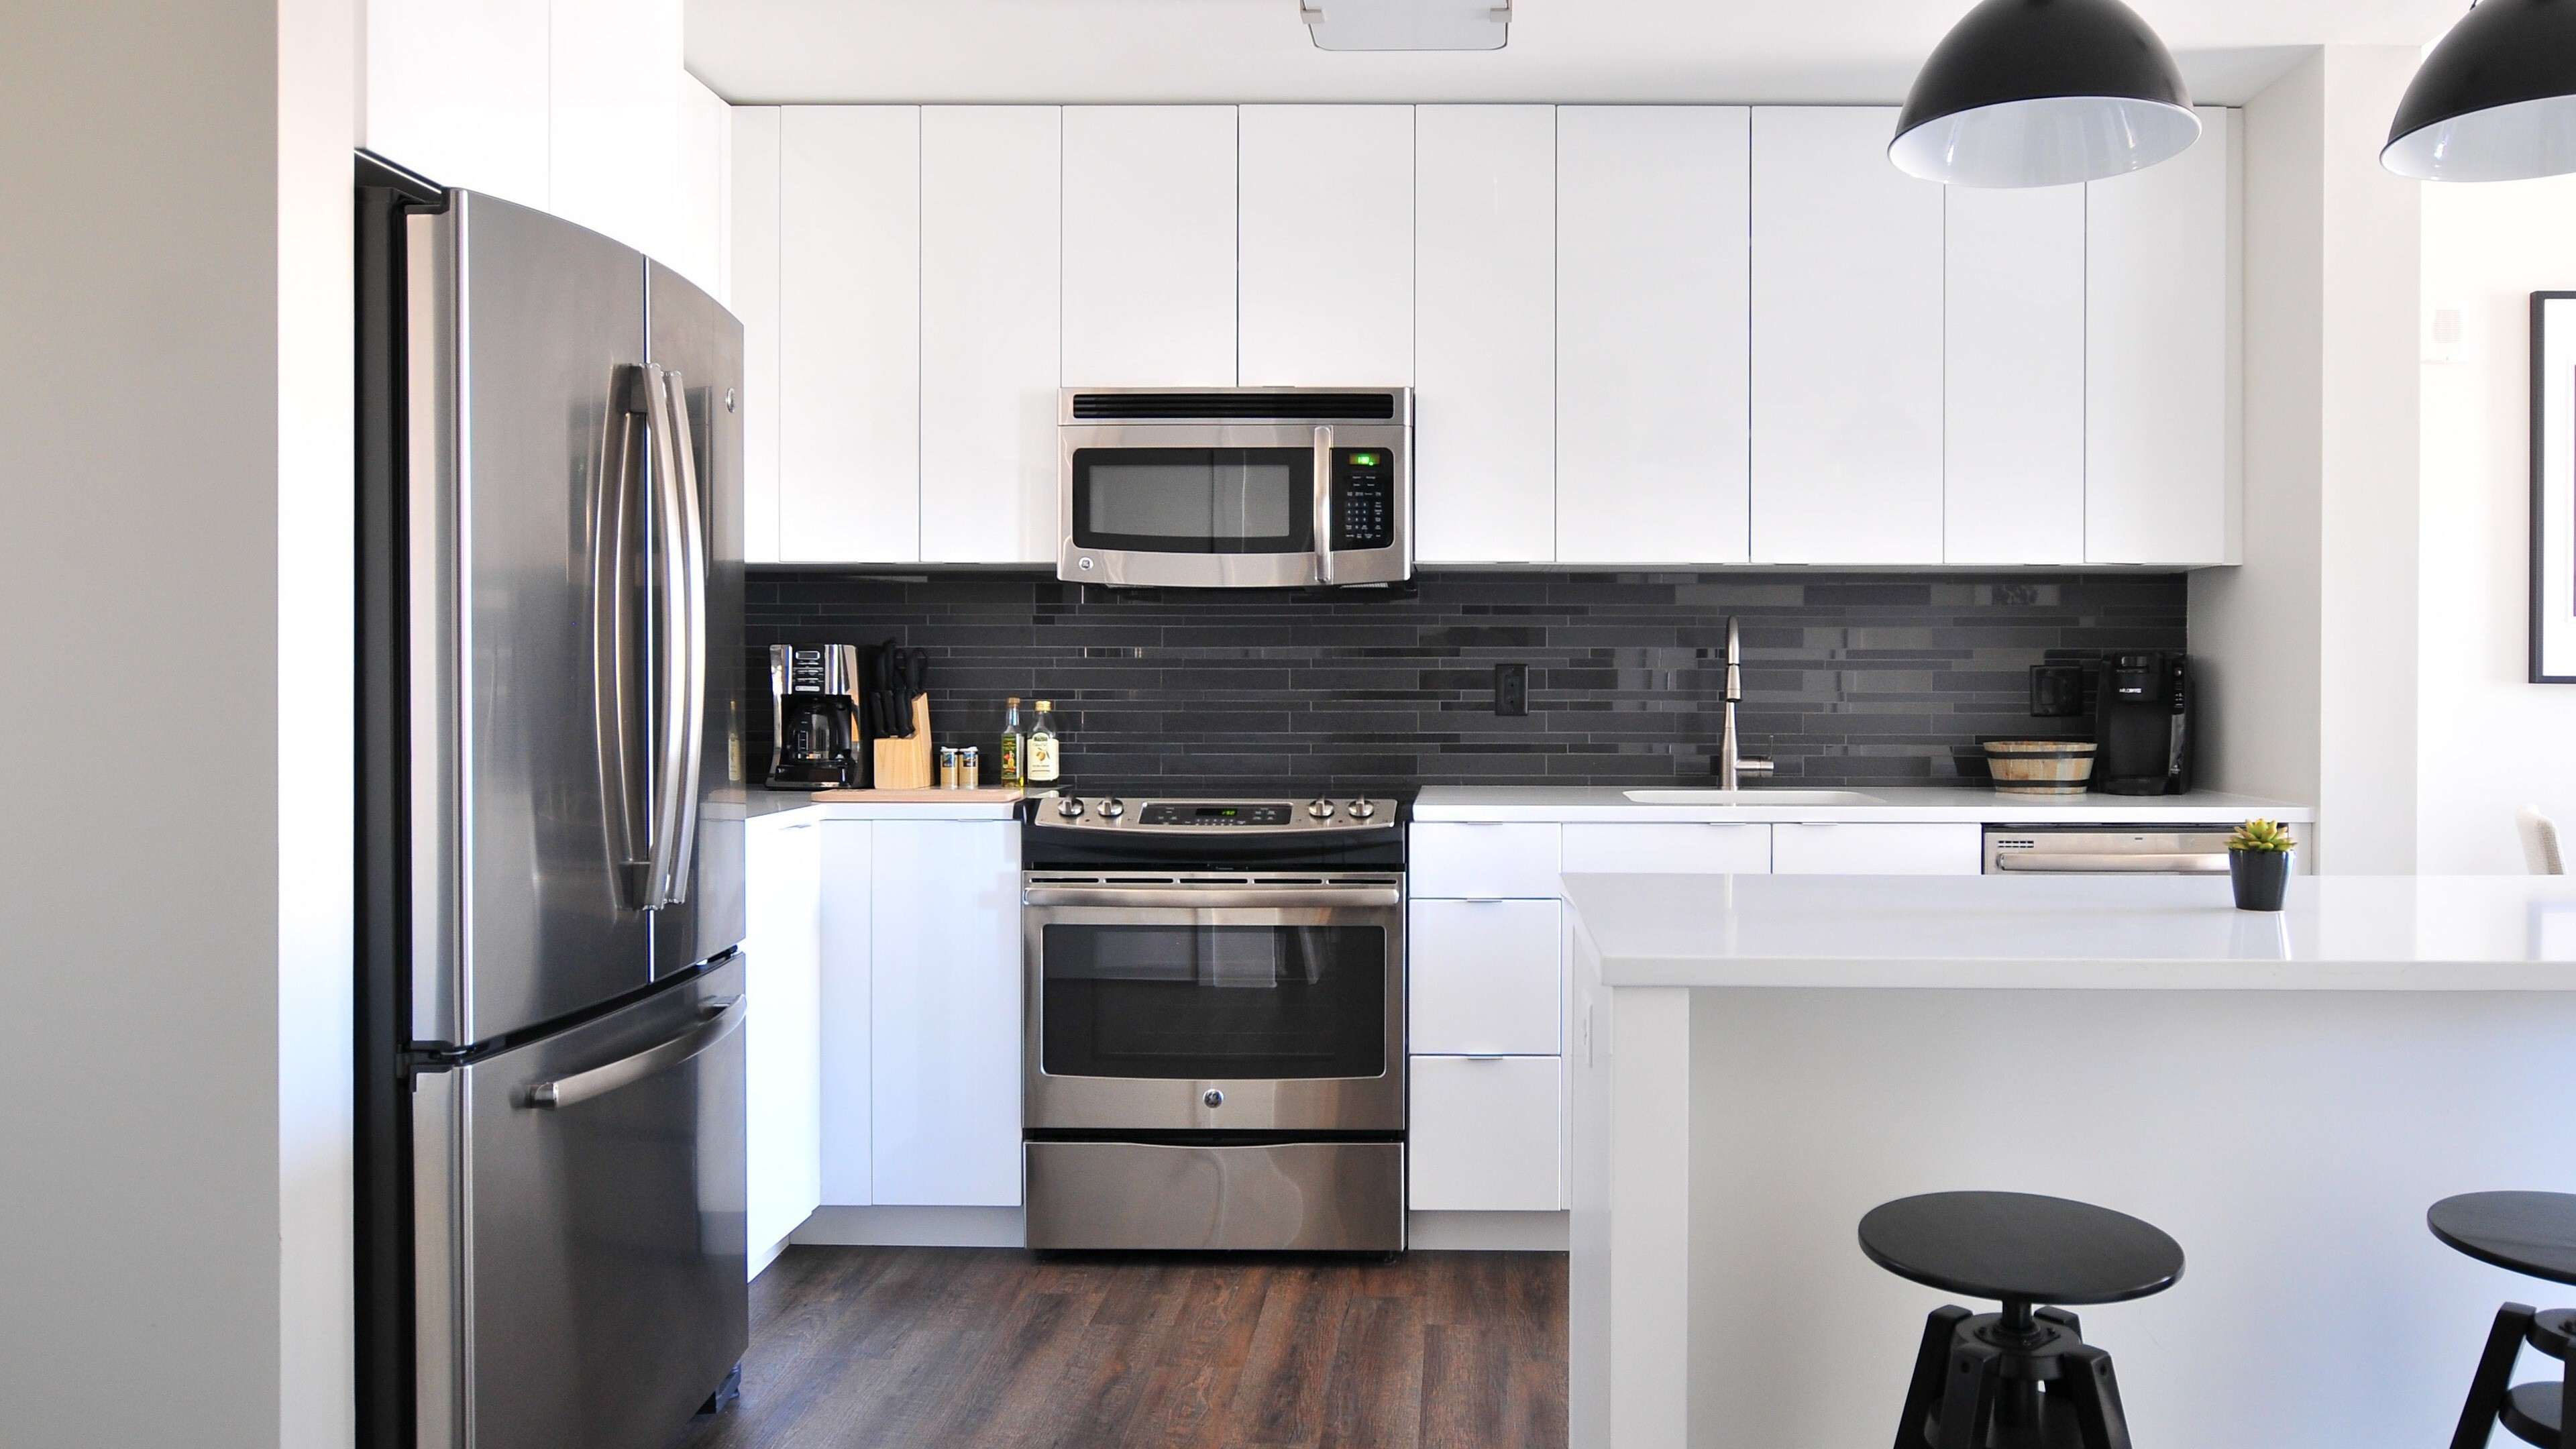 Luxury Kitchen Interior 4k Wallpaper Hd Wallpapers